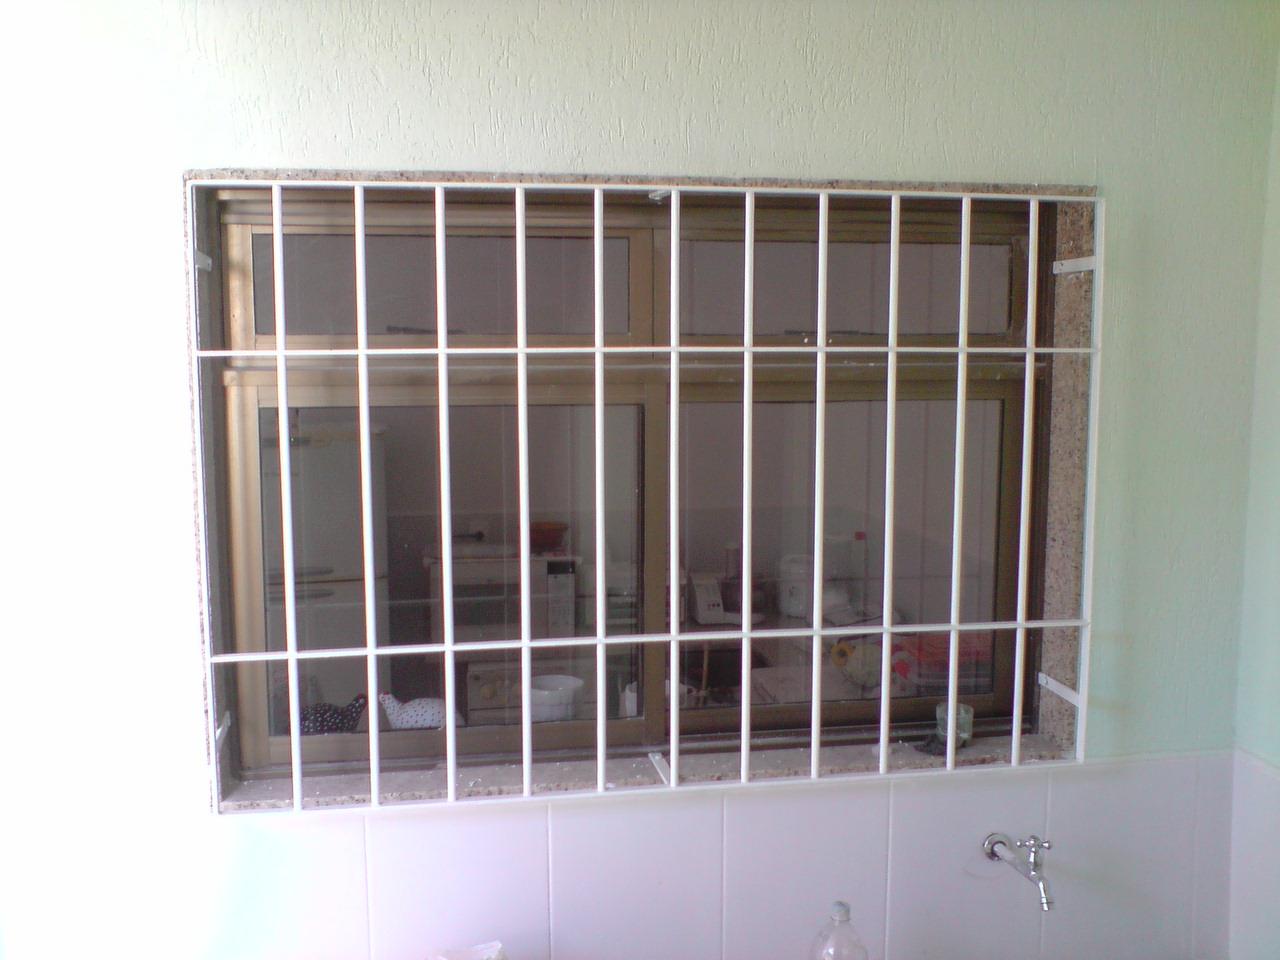 #785F53 ESTRUTURAS METÁLICAS E REFORMAS GERAIS: GRADES P/ JANELAS 4136 Grade De Ferro Para Janela De Aluminio